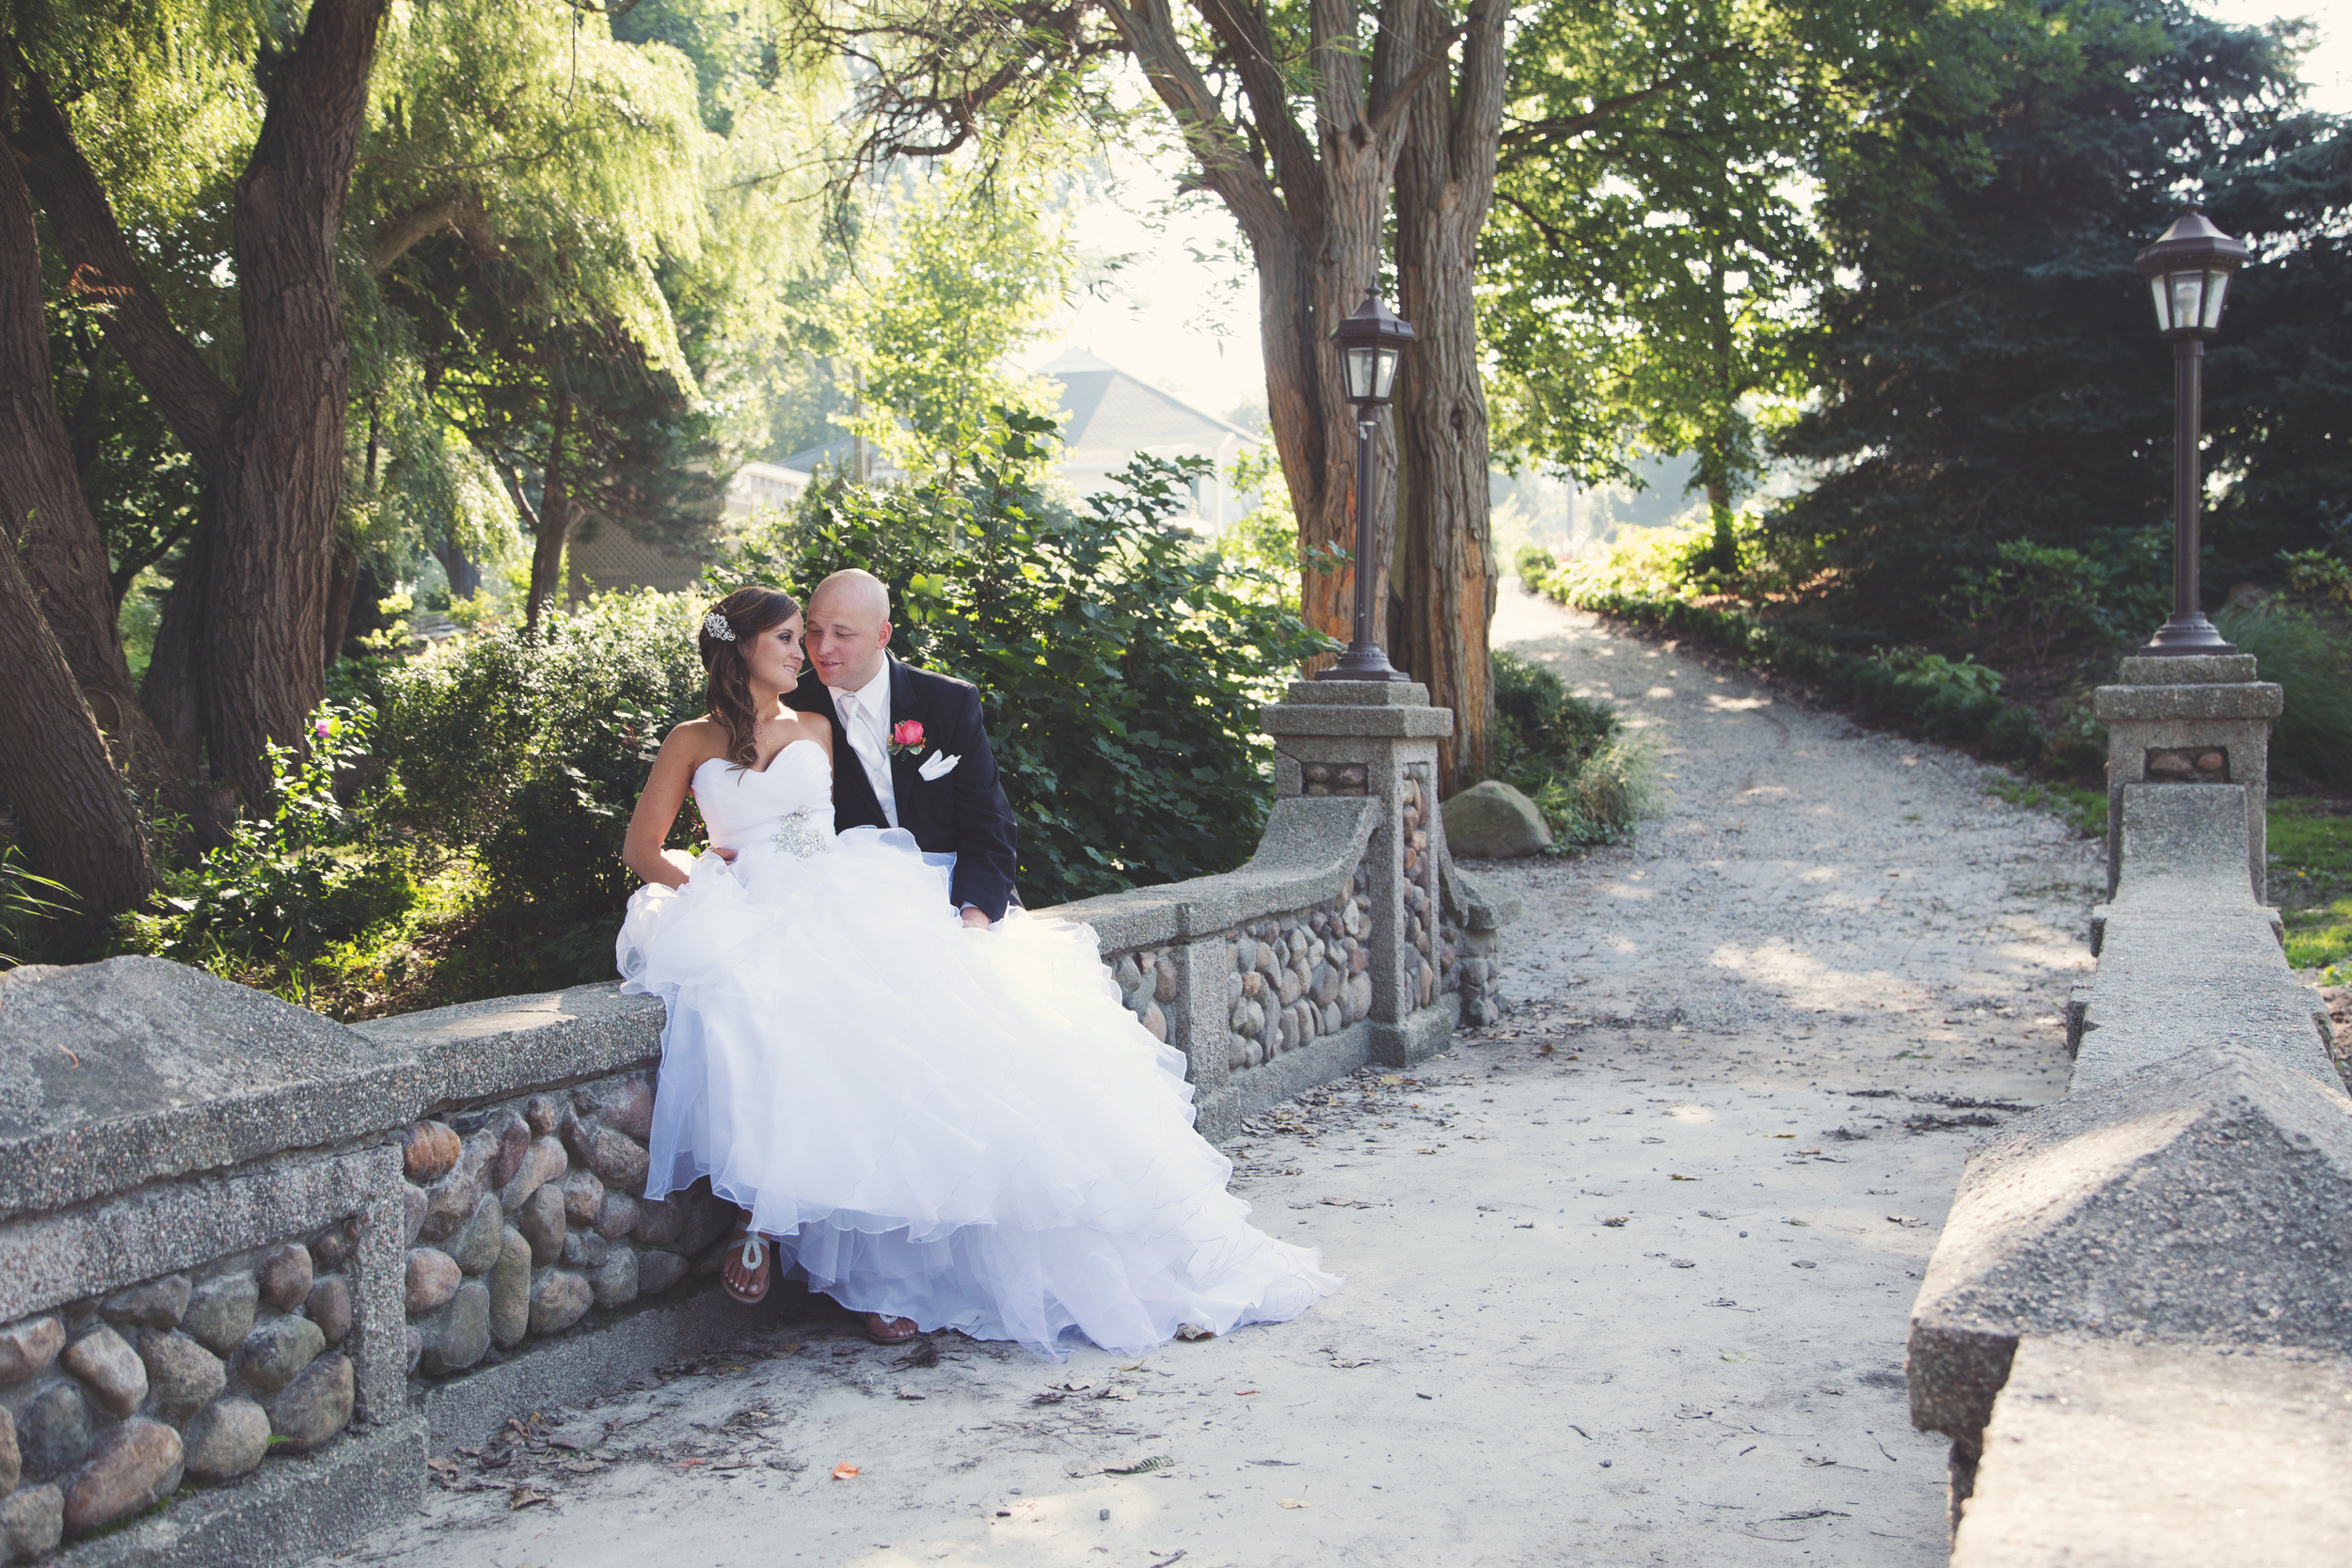 ALTWillms WeddingIMG_5363.jpg